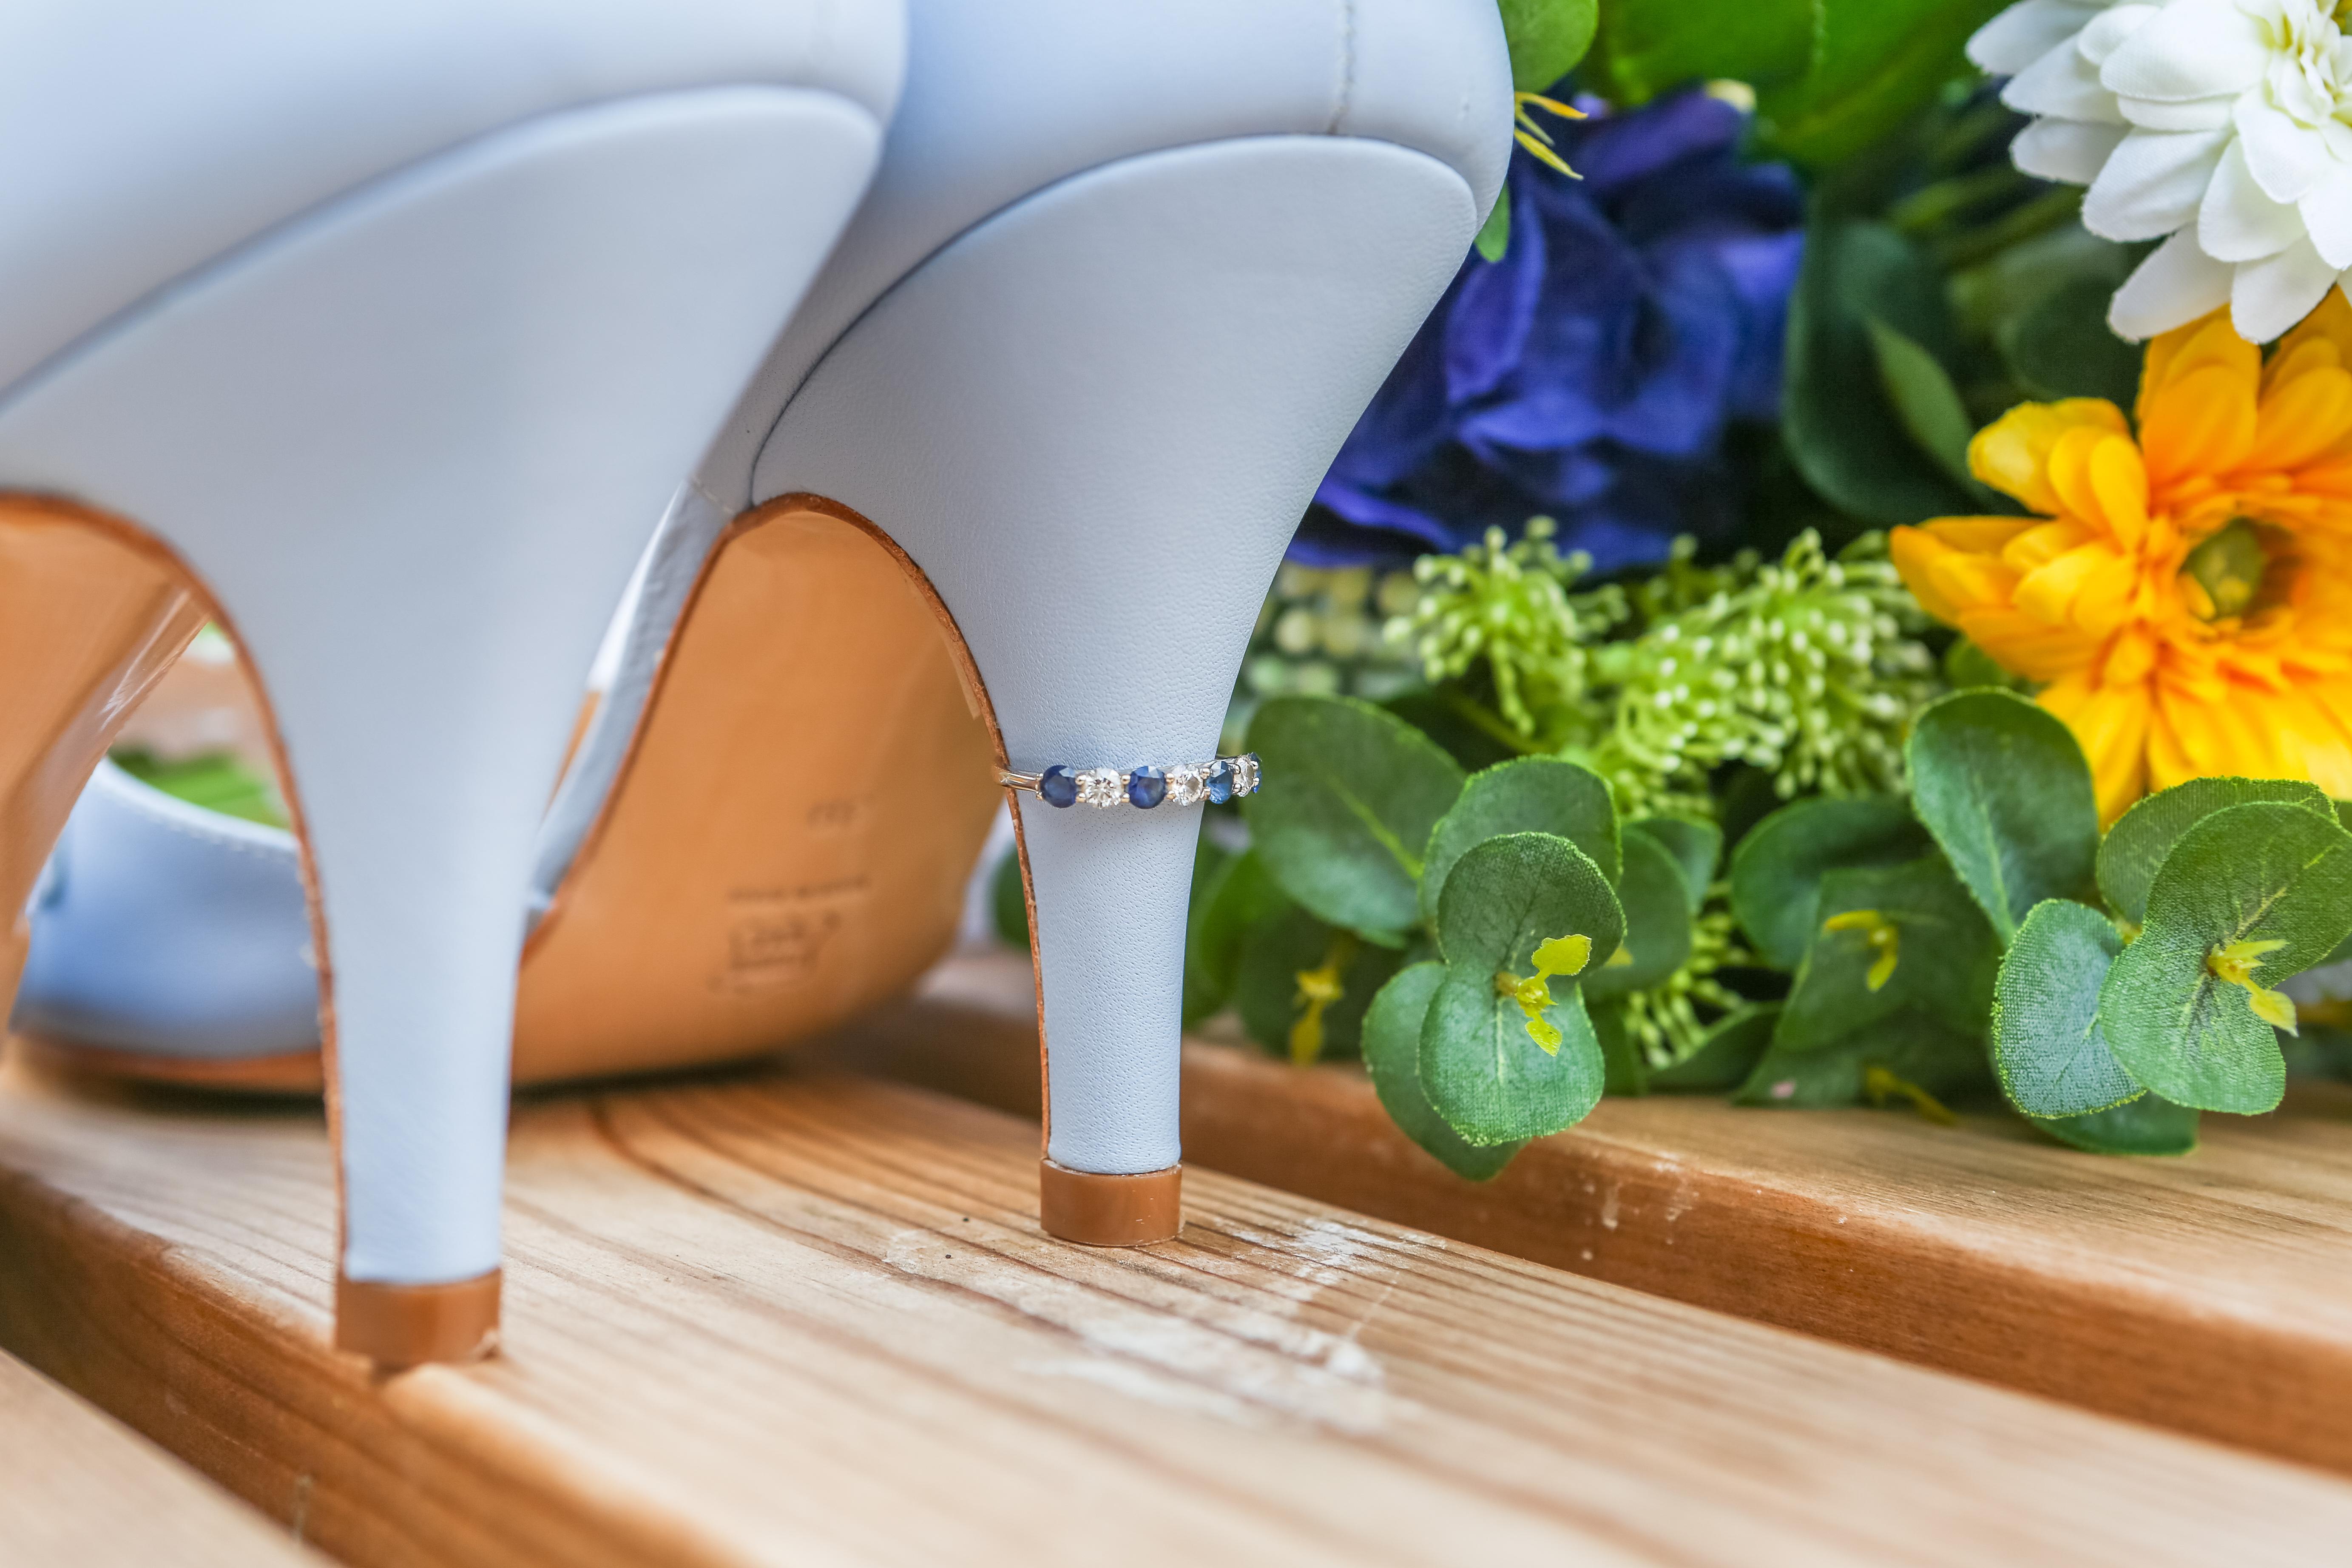 Vikki & Ollie - Fizzy Robot Photography2